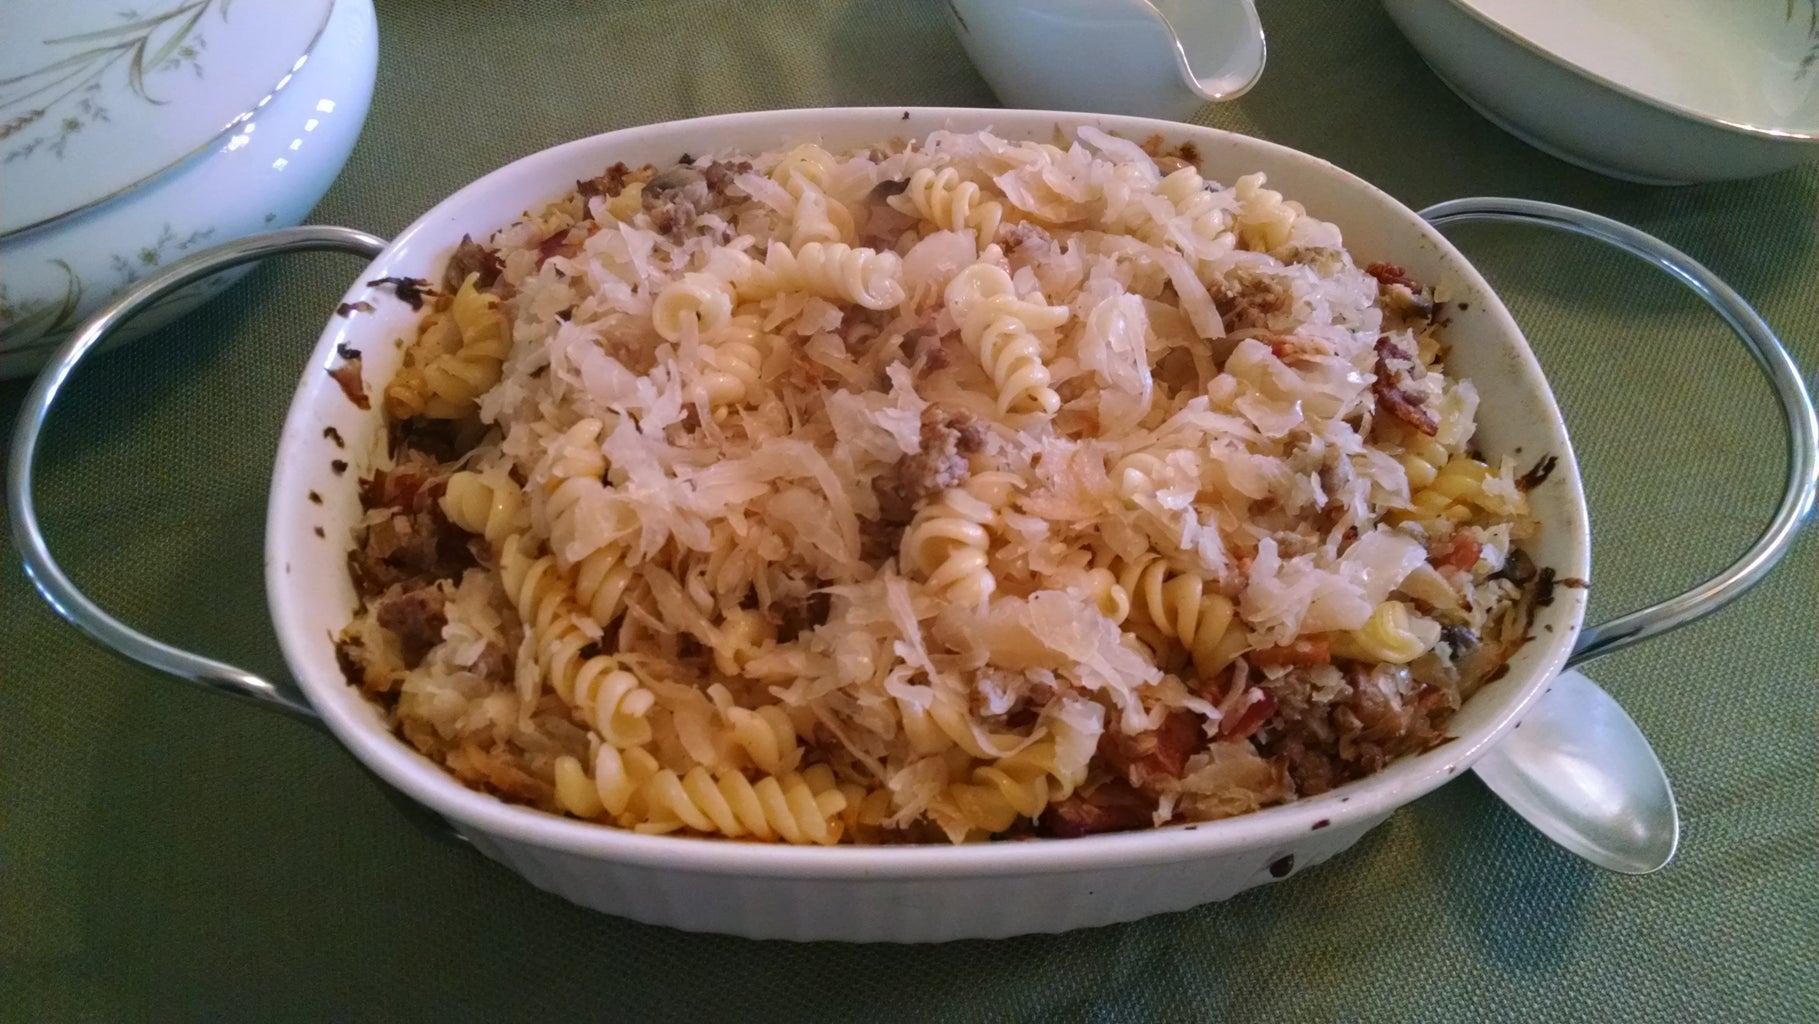 Bacon, Sauerkraut, and Pasta Bake